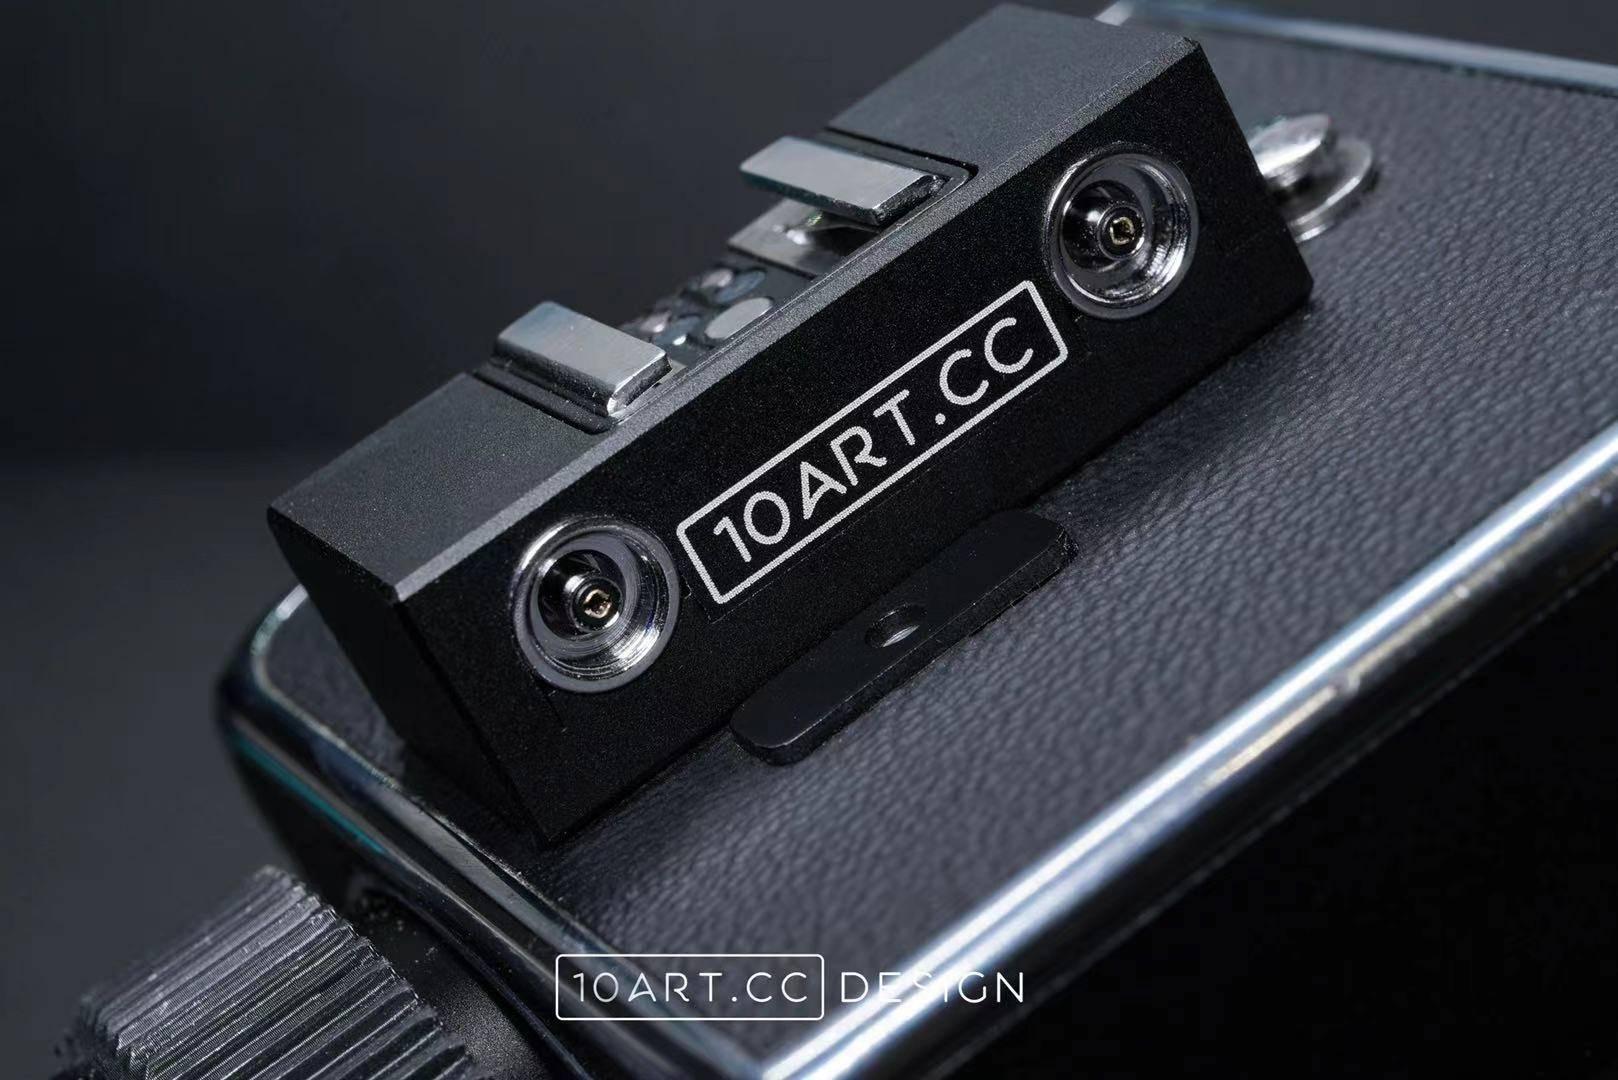 10ARTCC DESIGN 哈苏热靴座-10ARTCC